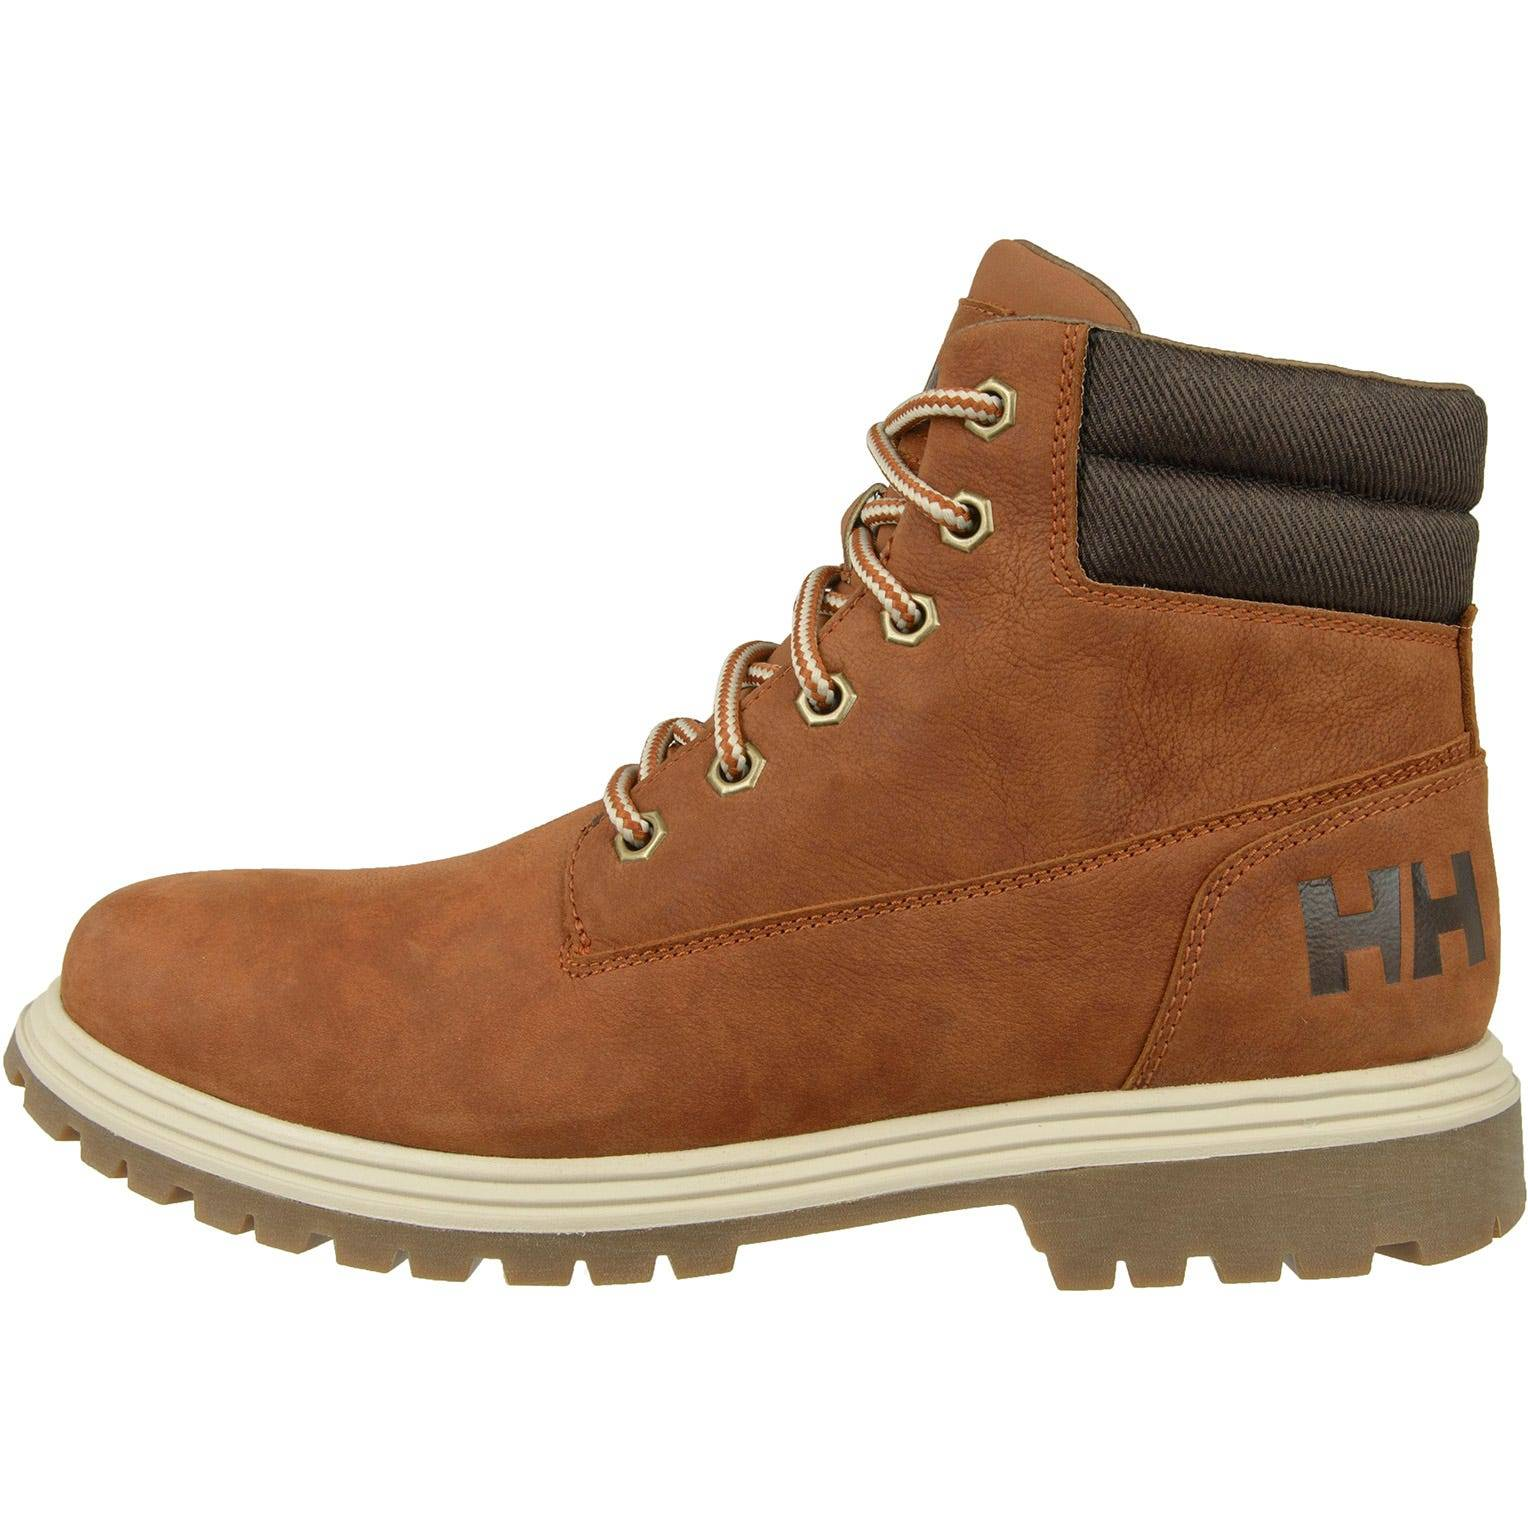 Helly Hansen Fremont Mens :casual Shoe Blue 40.5/7.5